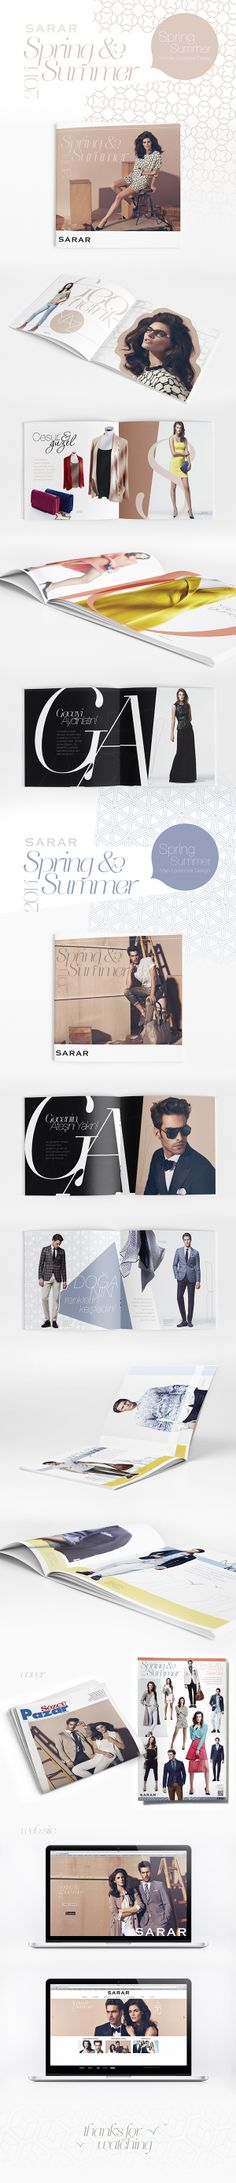 SARAR SS/14 Lookbook Design by yasemin cikrikci, via Behance